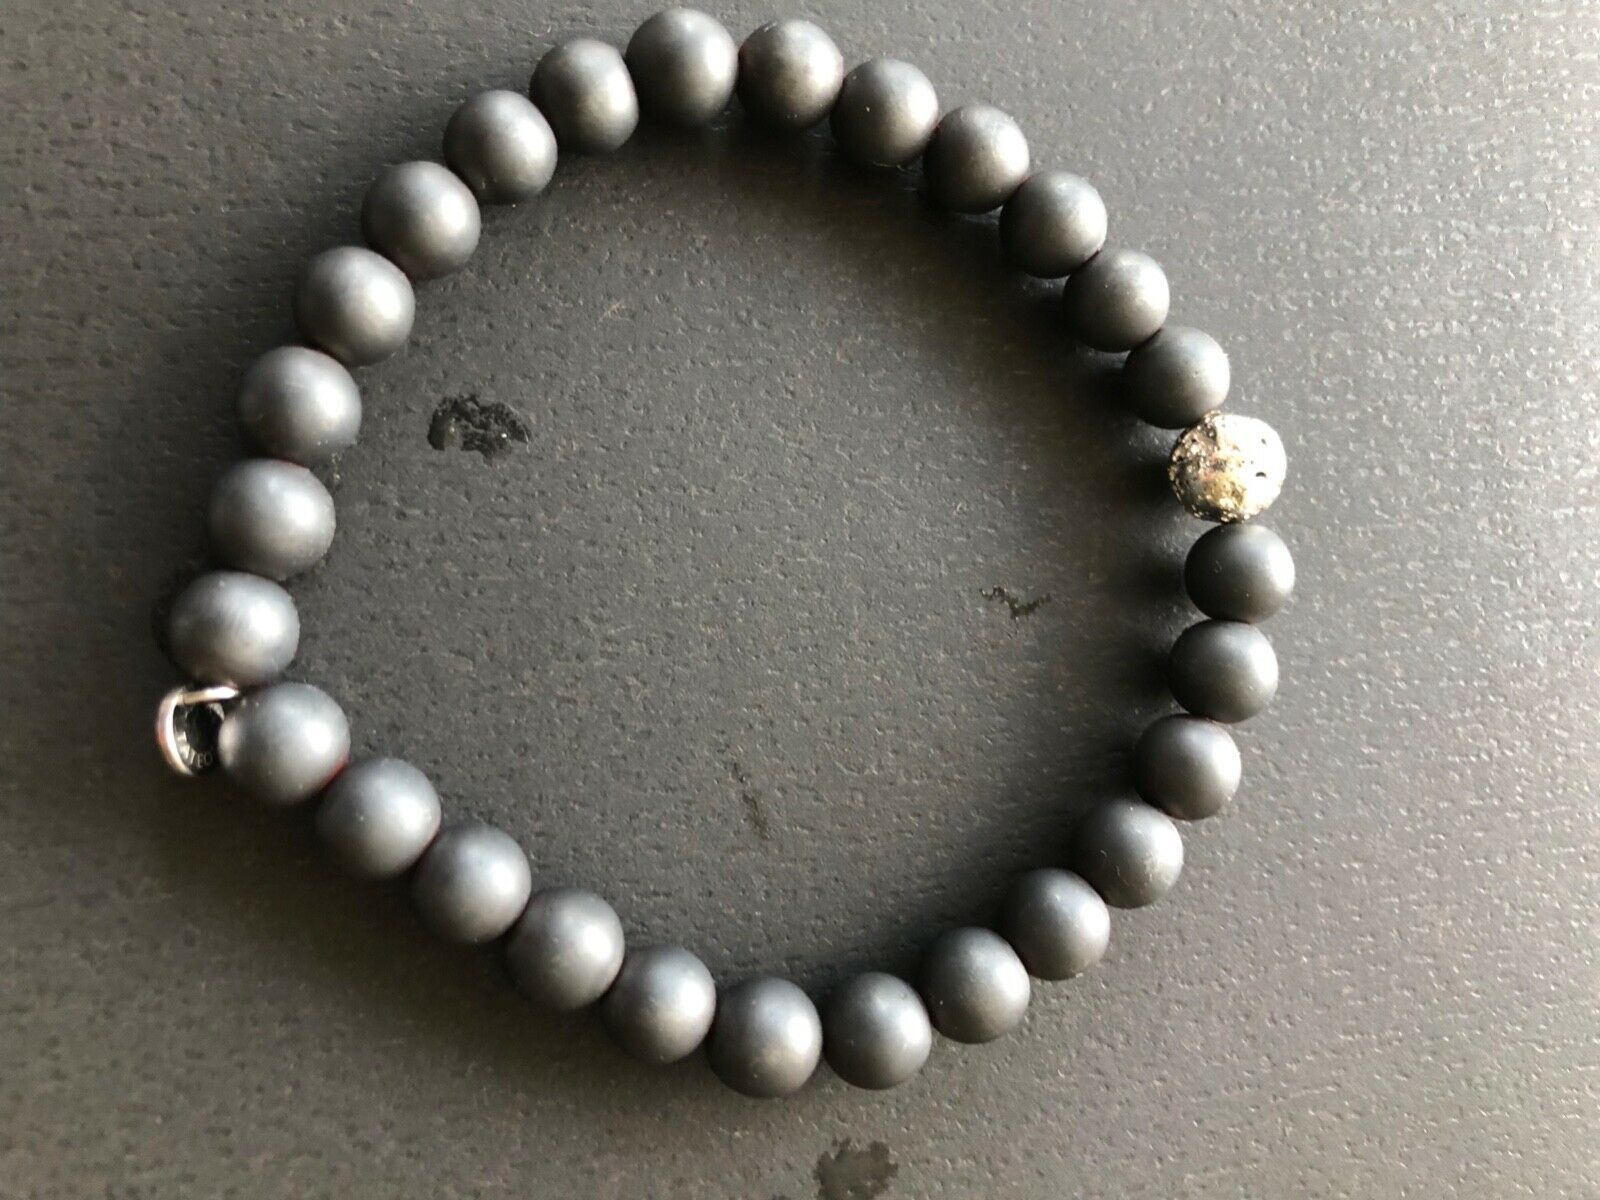 Tateossian Gray Bead Bracelet - $105.00